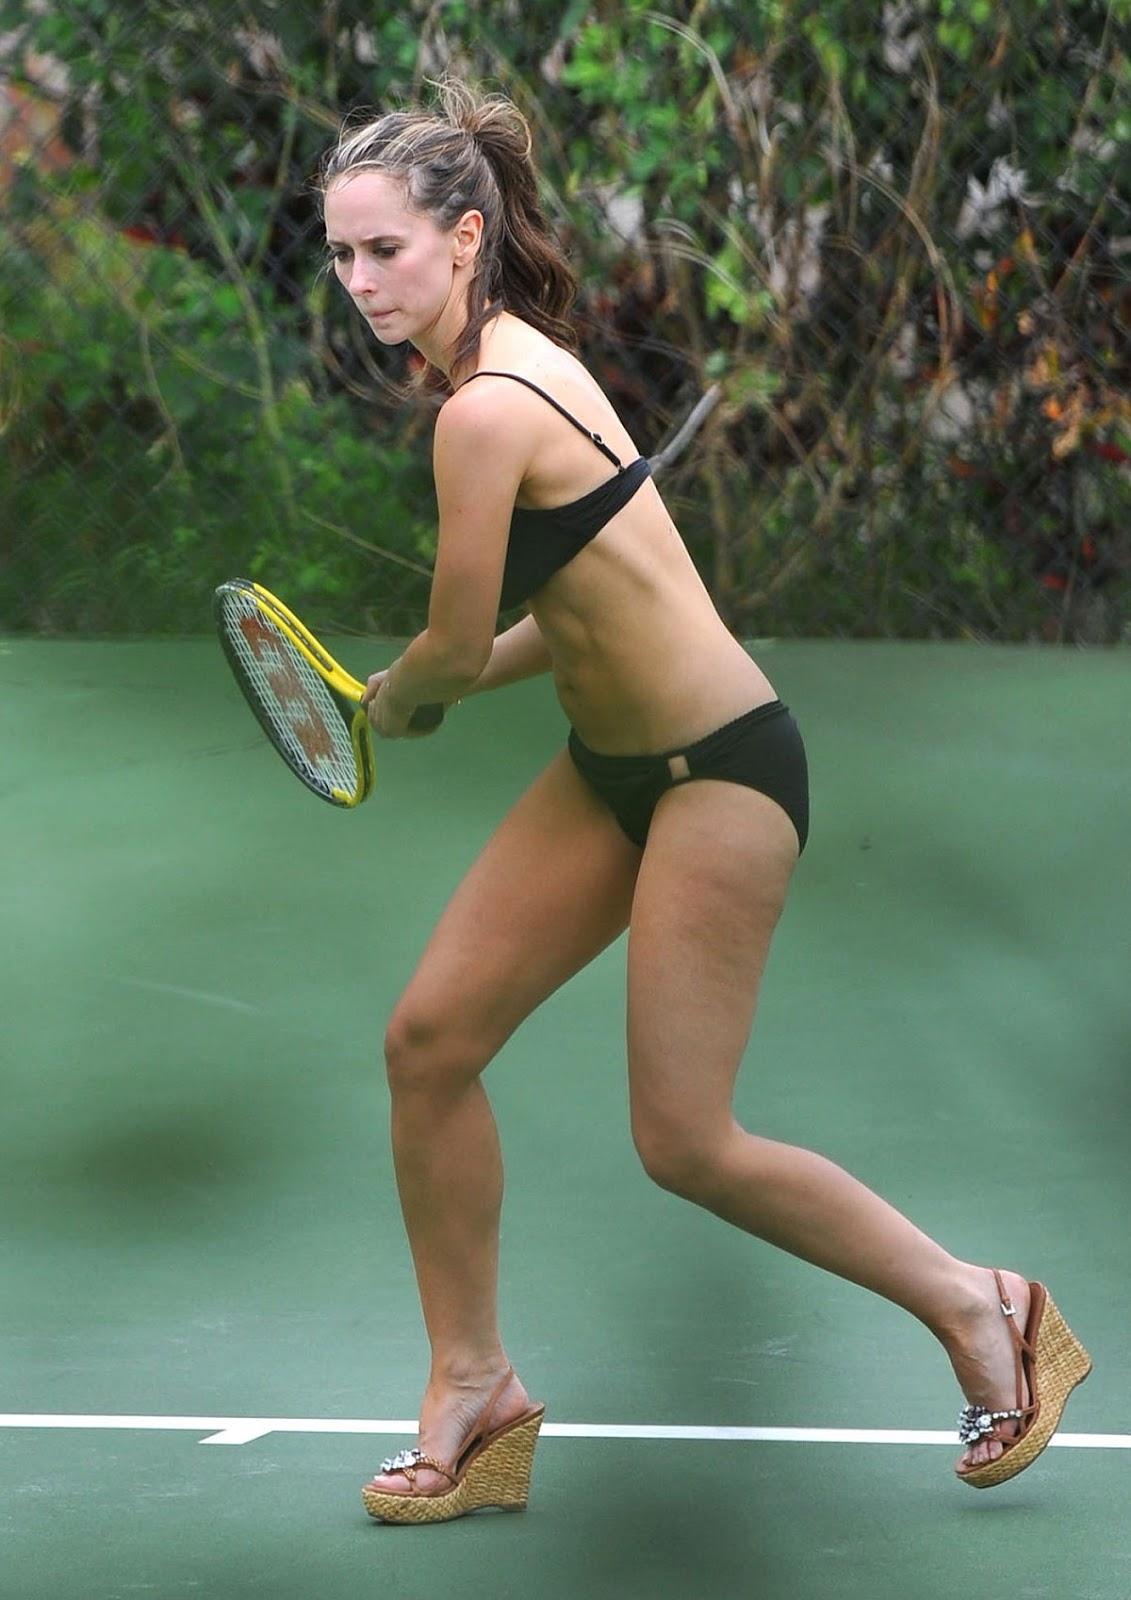 http://4.bp.blogspot.com/-JQeTwjxkSoE/T4MkY9pN5fI/AAAAAAAAAPA/dNPDXTZ28V4/s1600/jennifer-love-hewitt-tennis-bikini.jpg